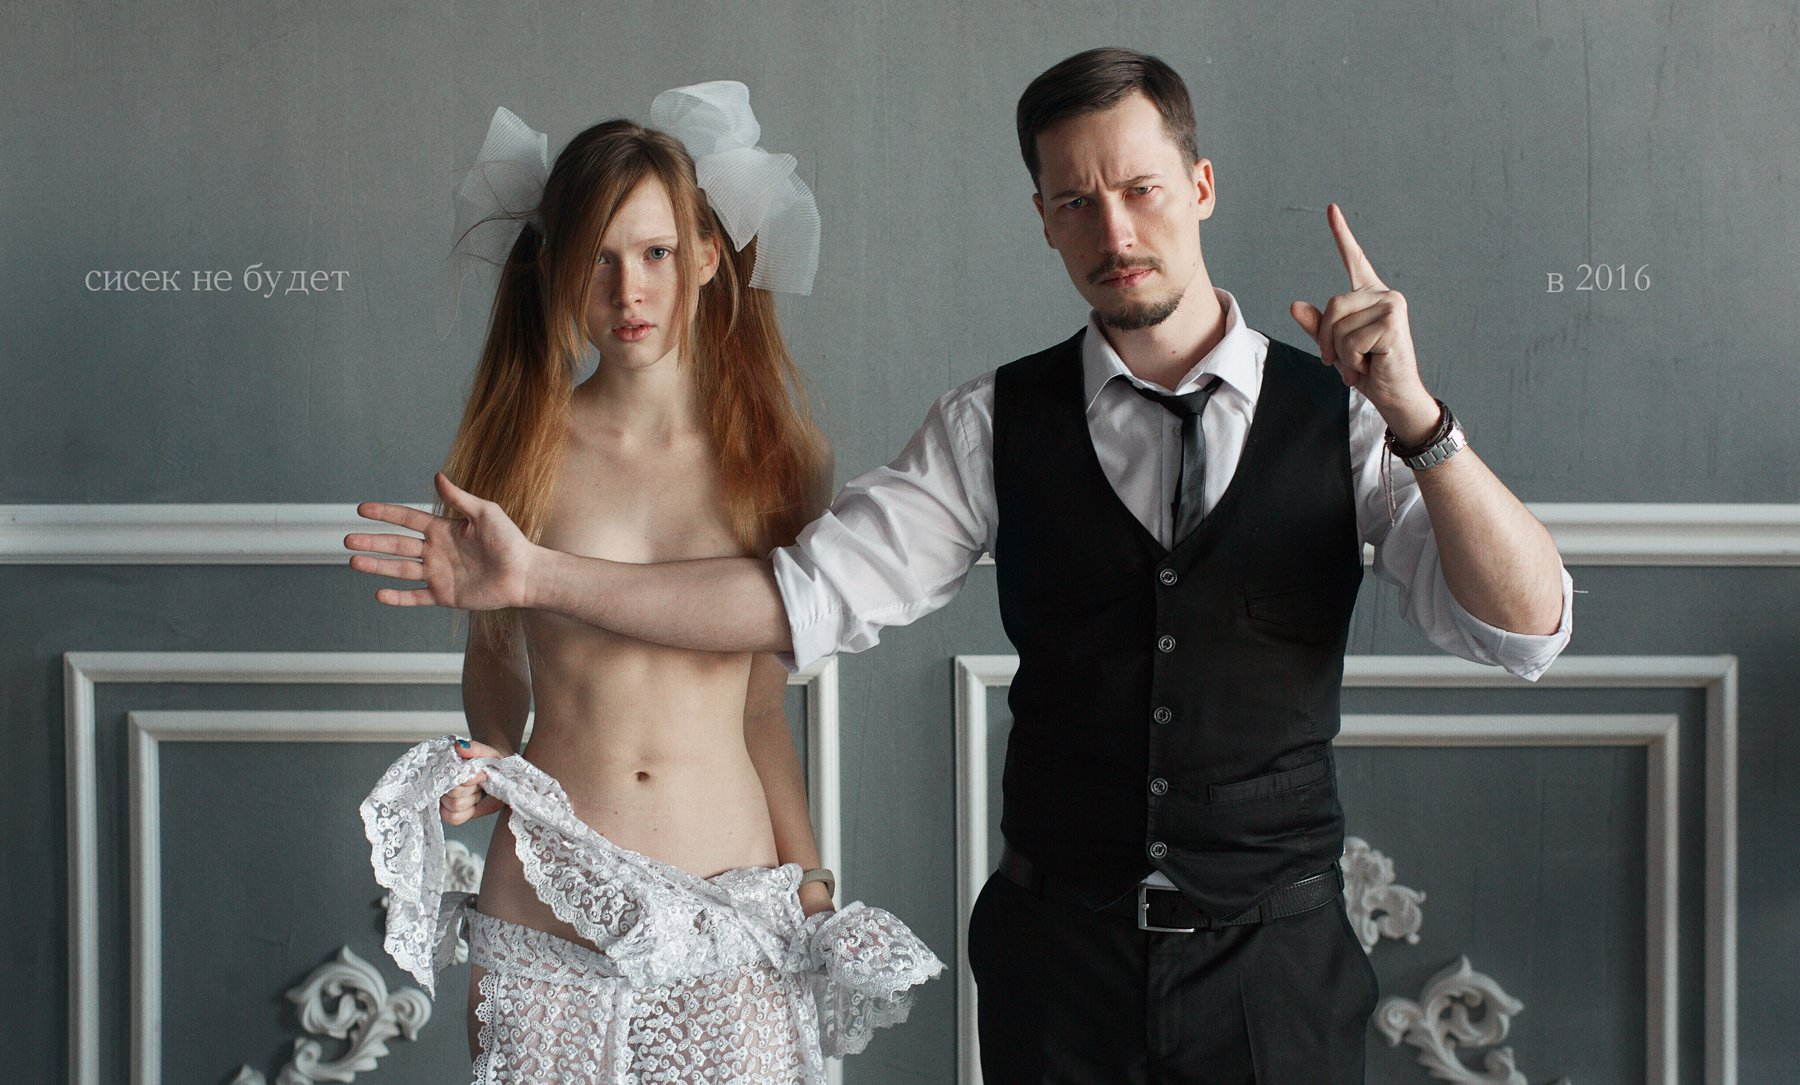 girl, studio, man, me, schoolgirl, classic, boobs, no, 2016, =), humor,, Роман Филиппов